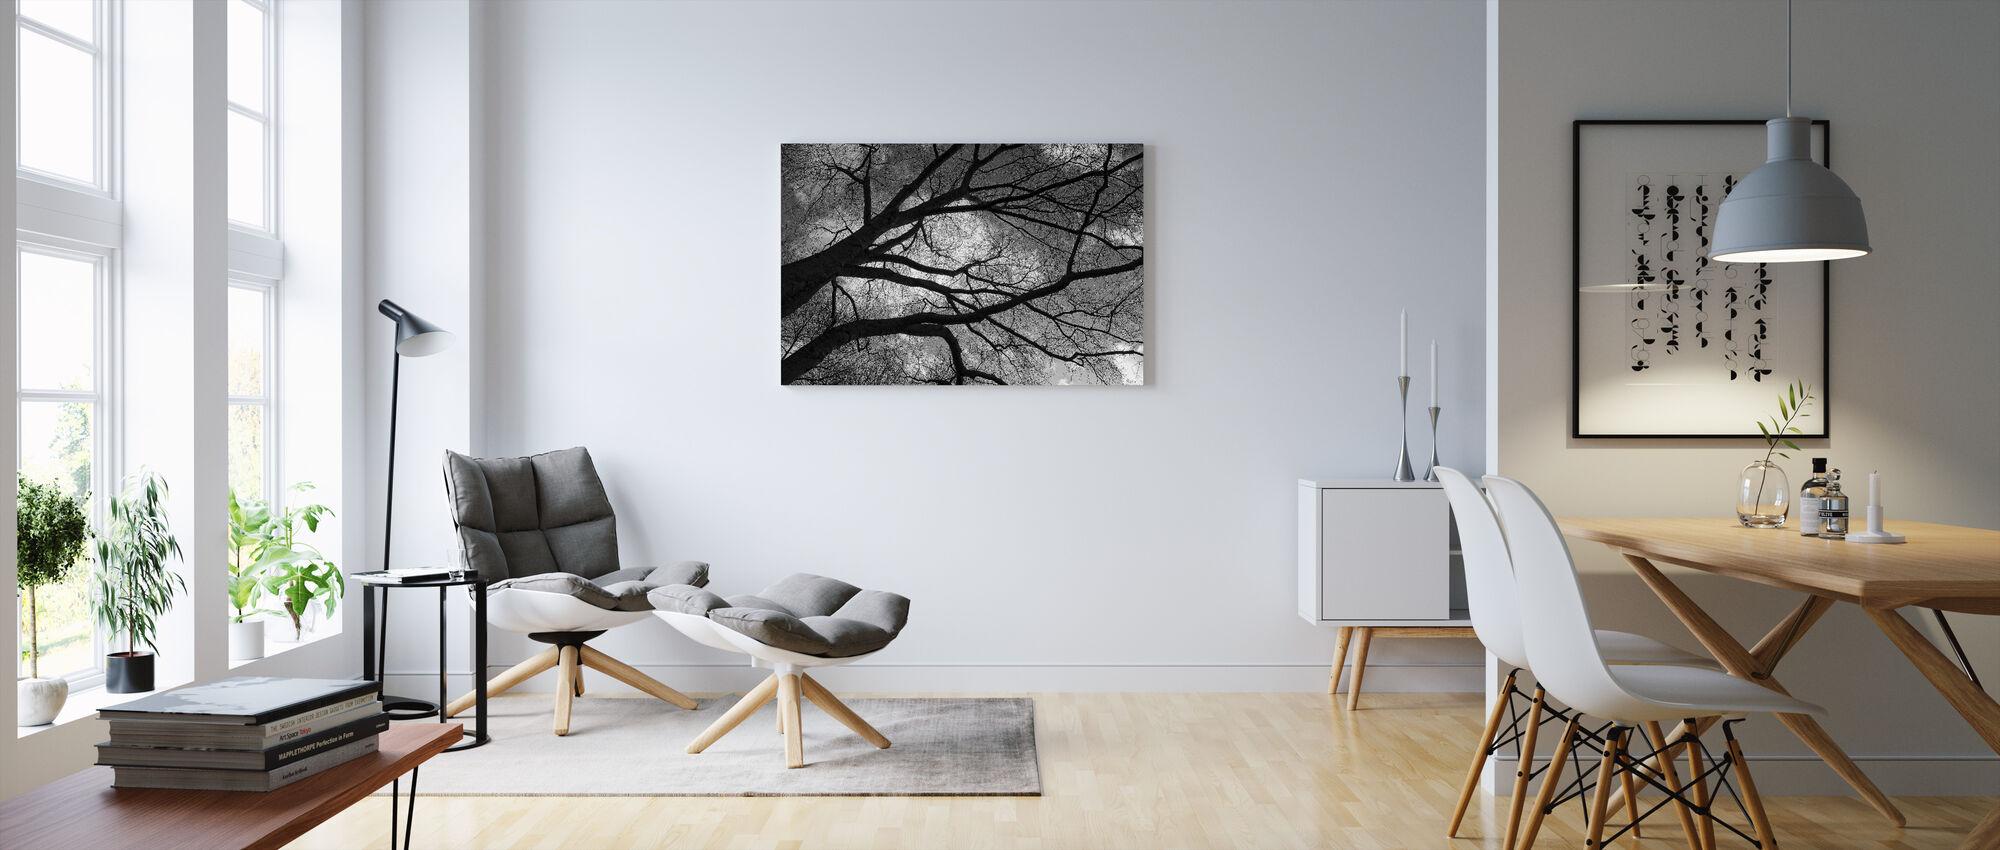 Tumma talvi Puu - Canvastaulu - Olohuone